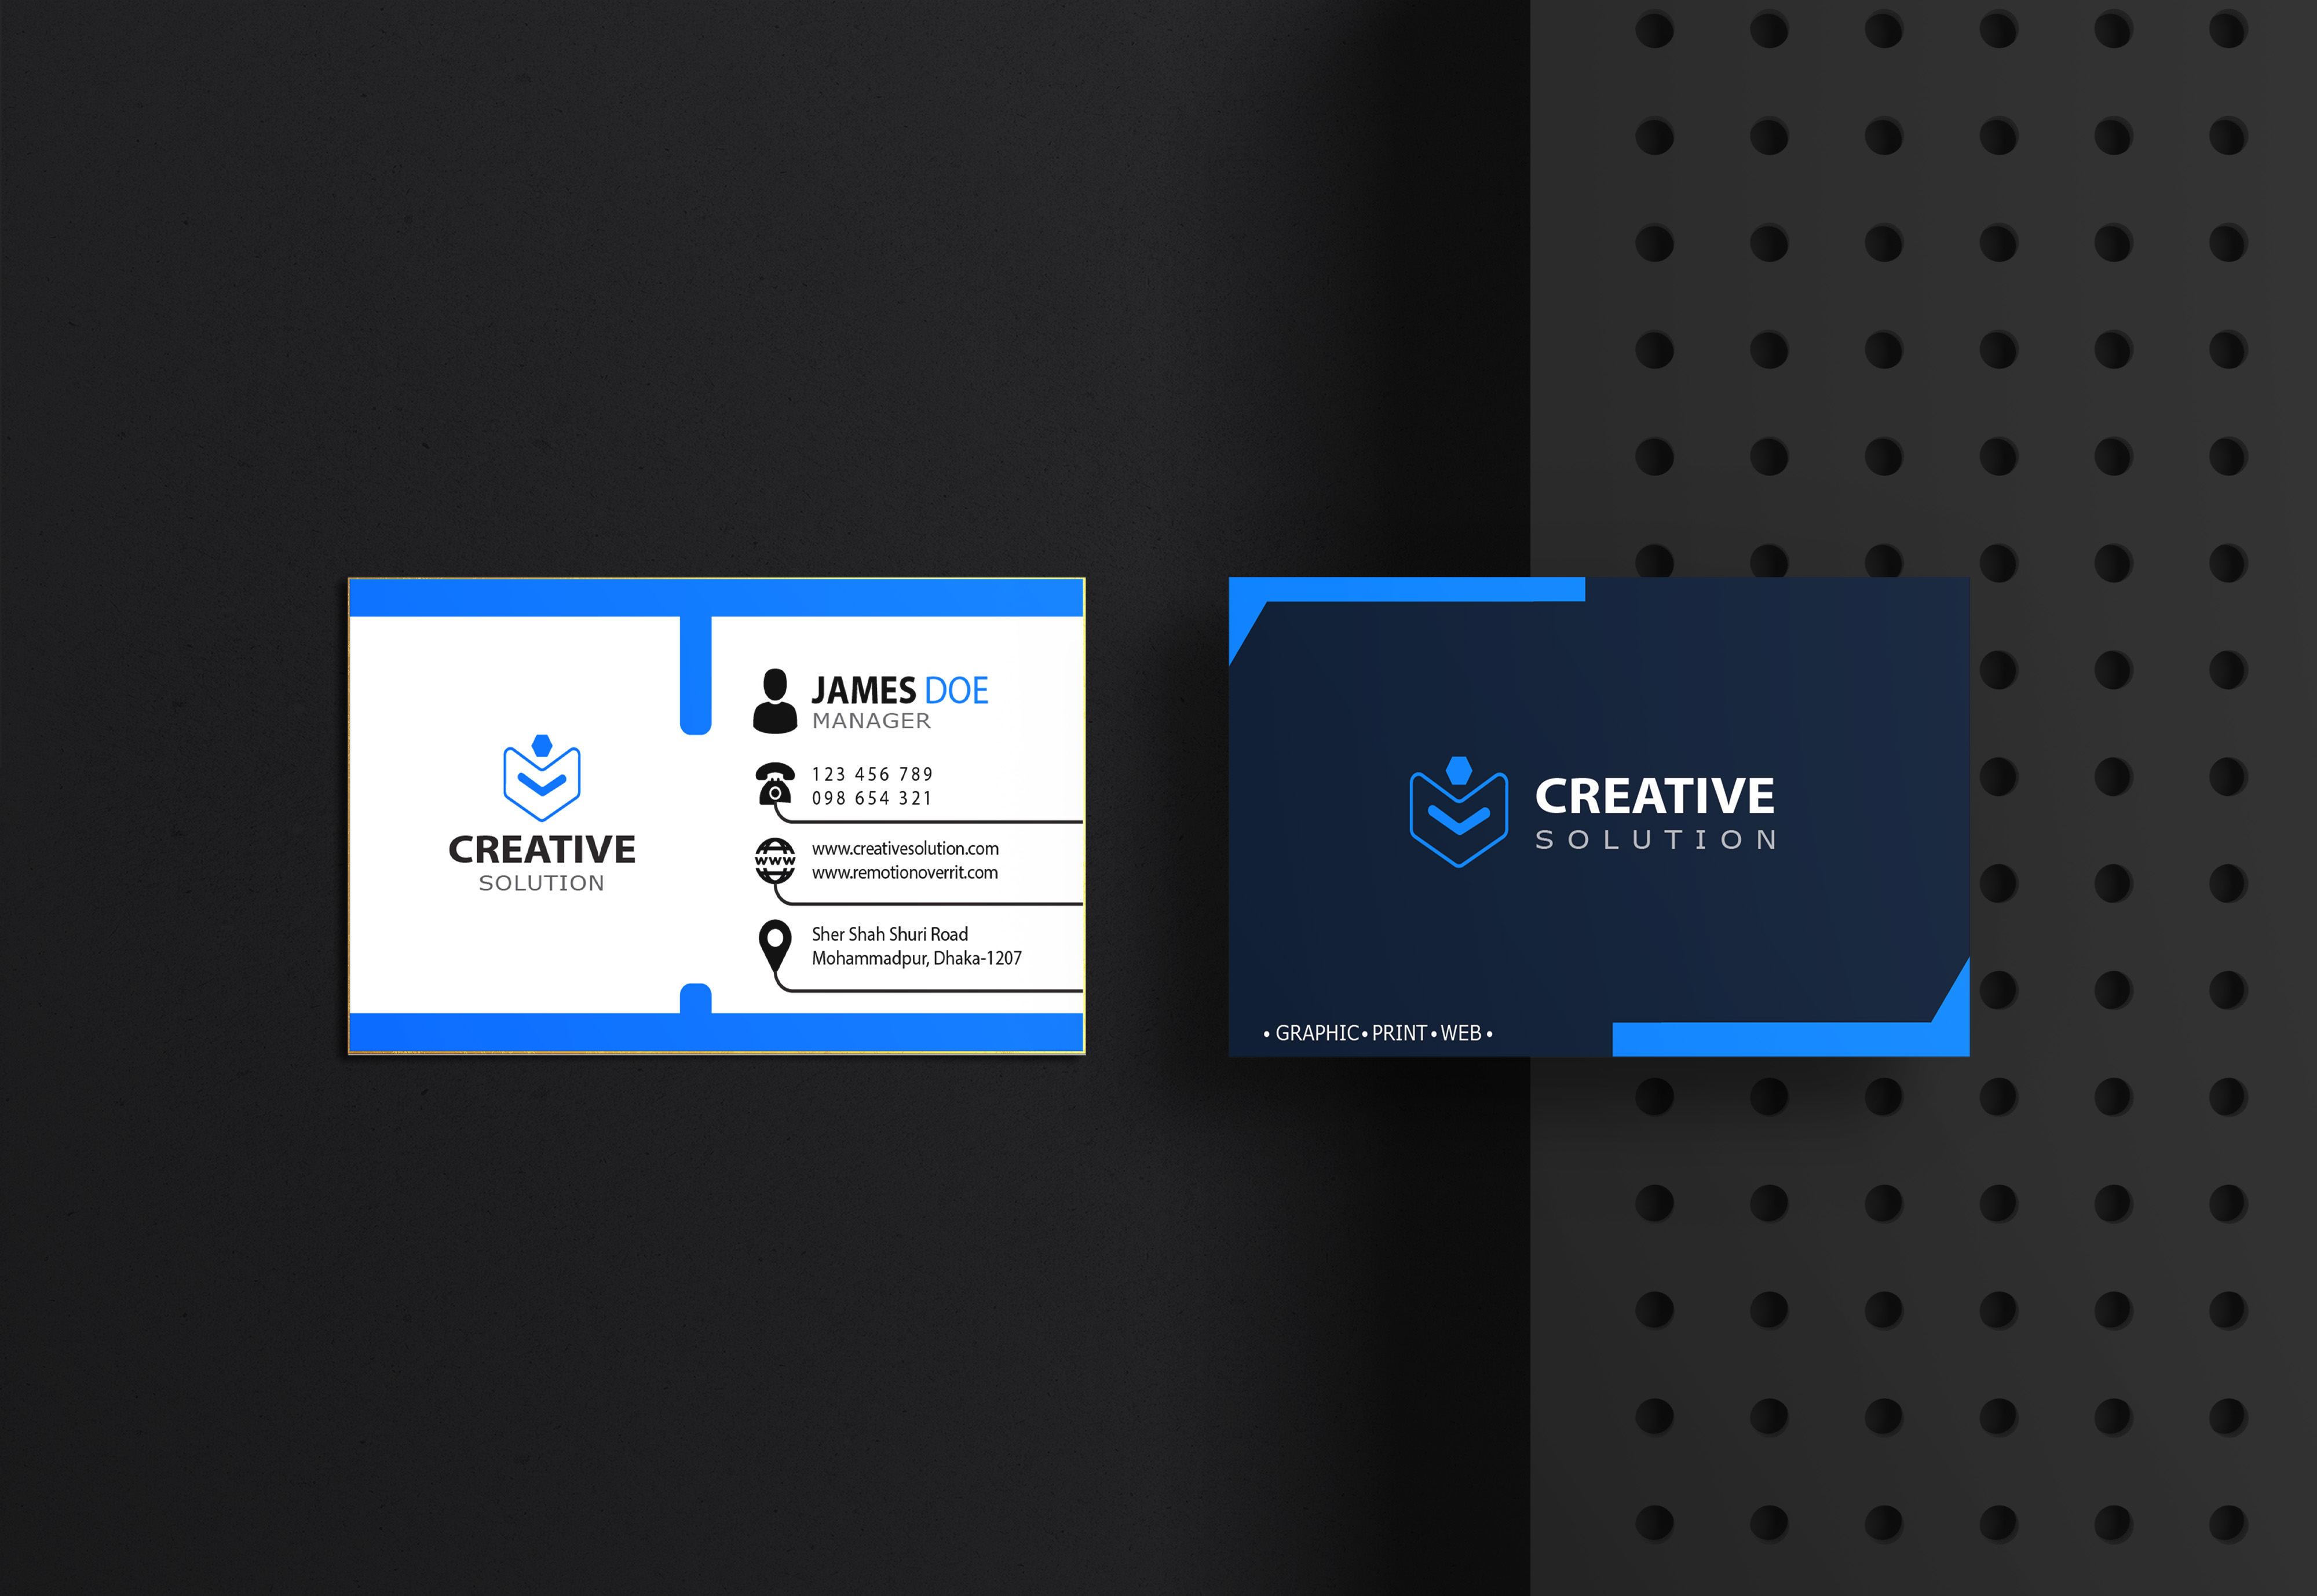 I will provide professional, creative and unique business card design